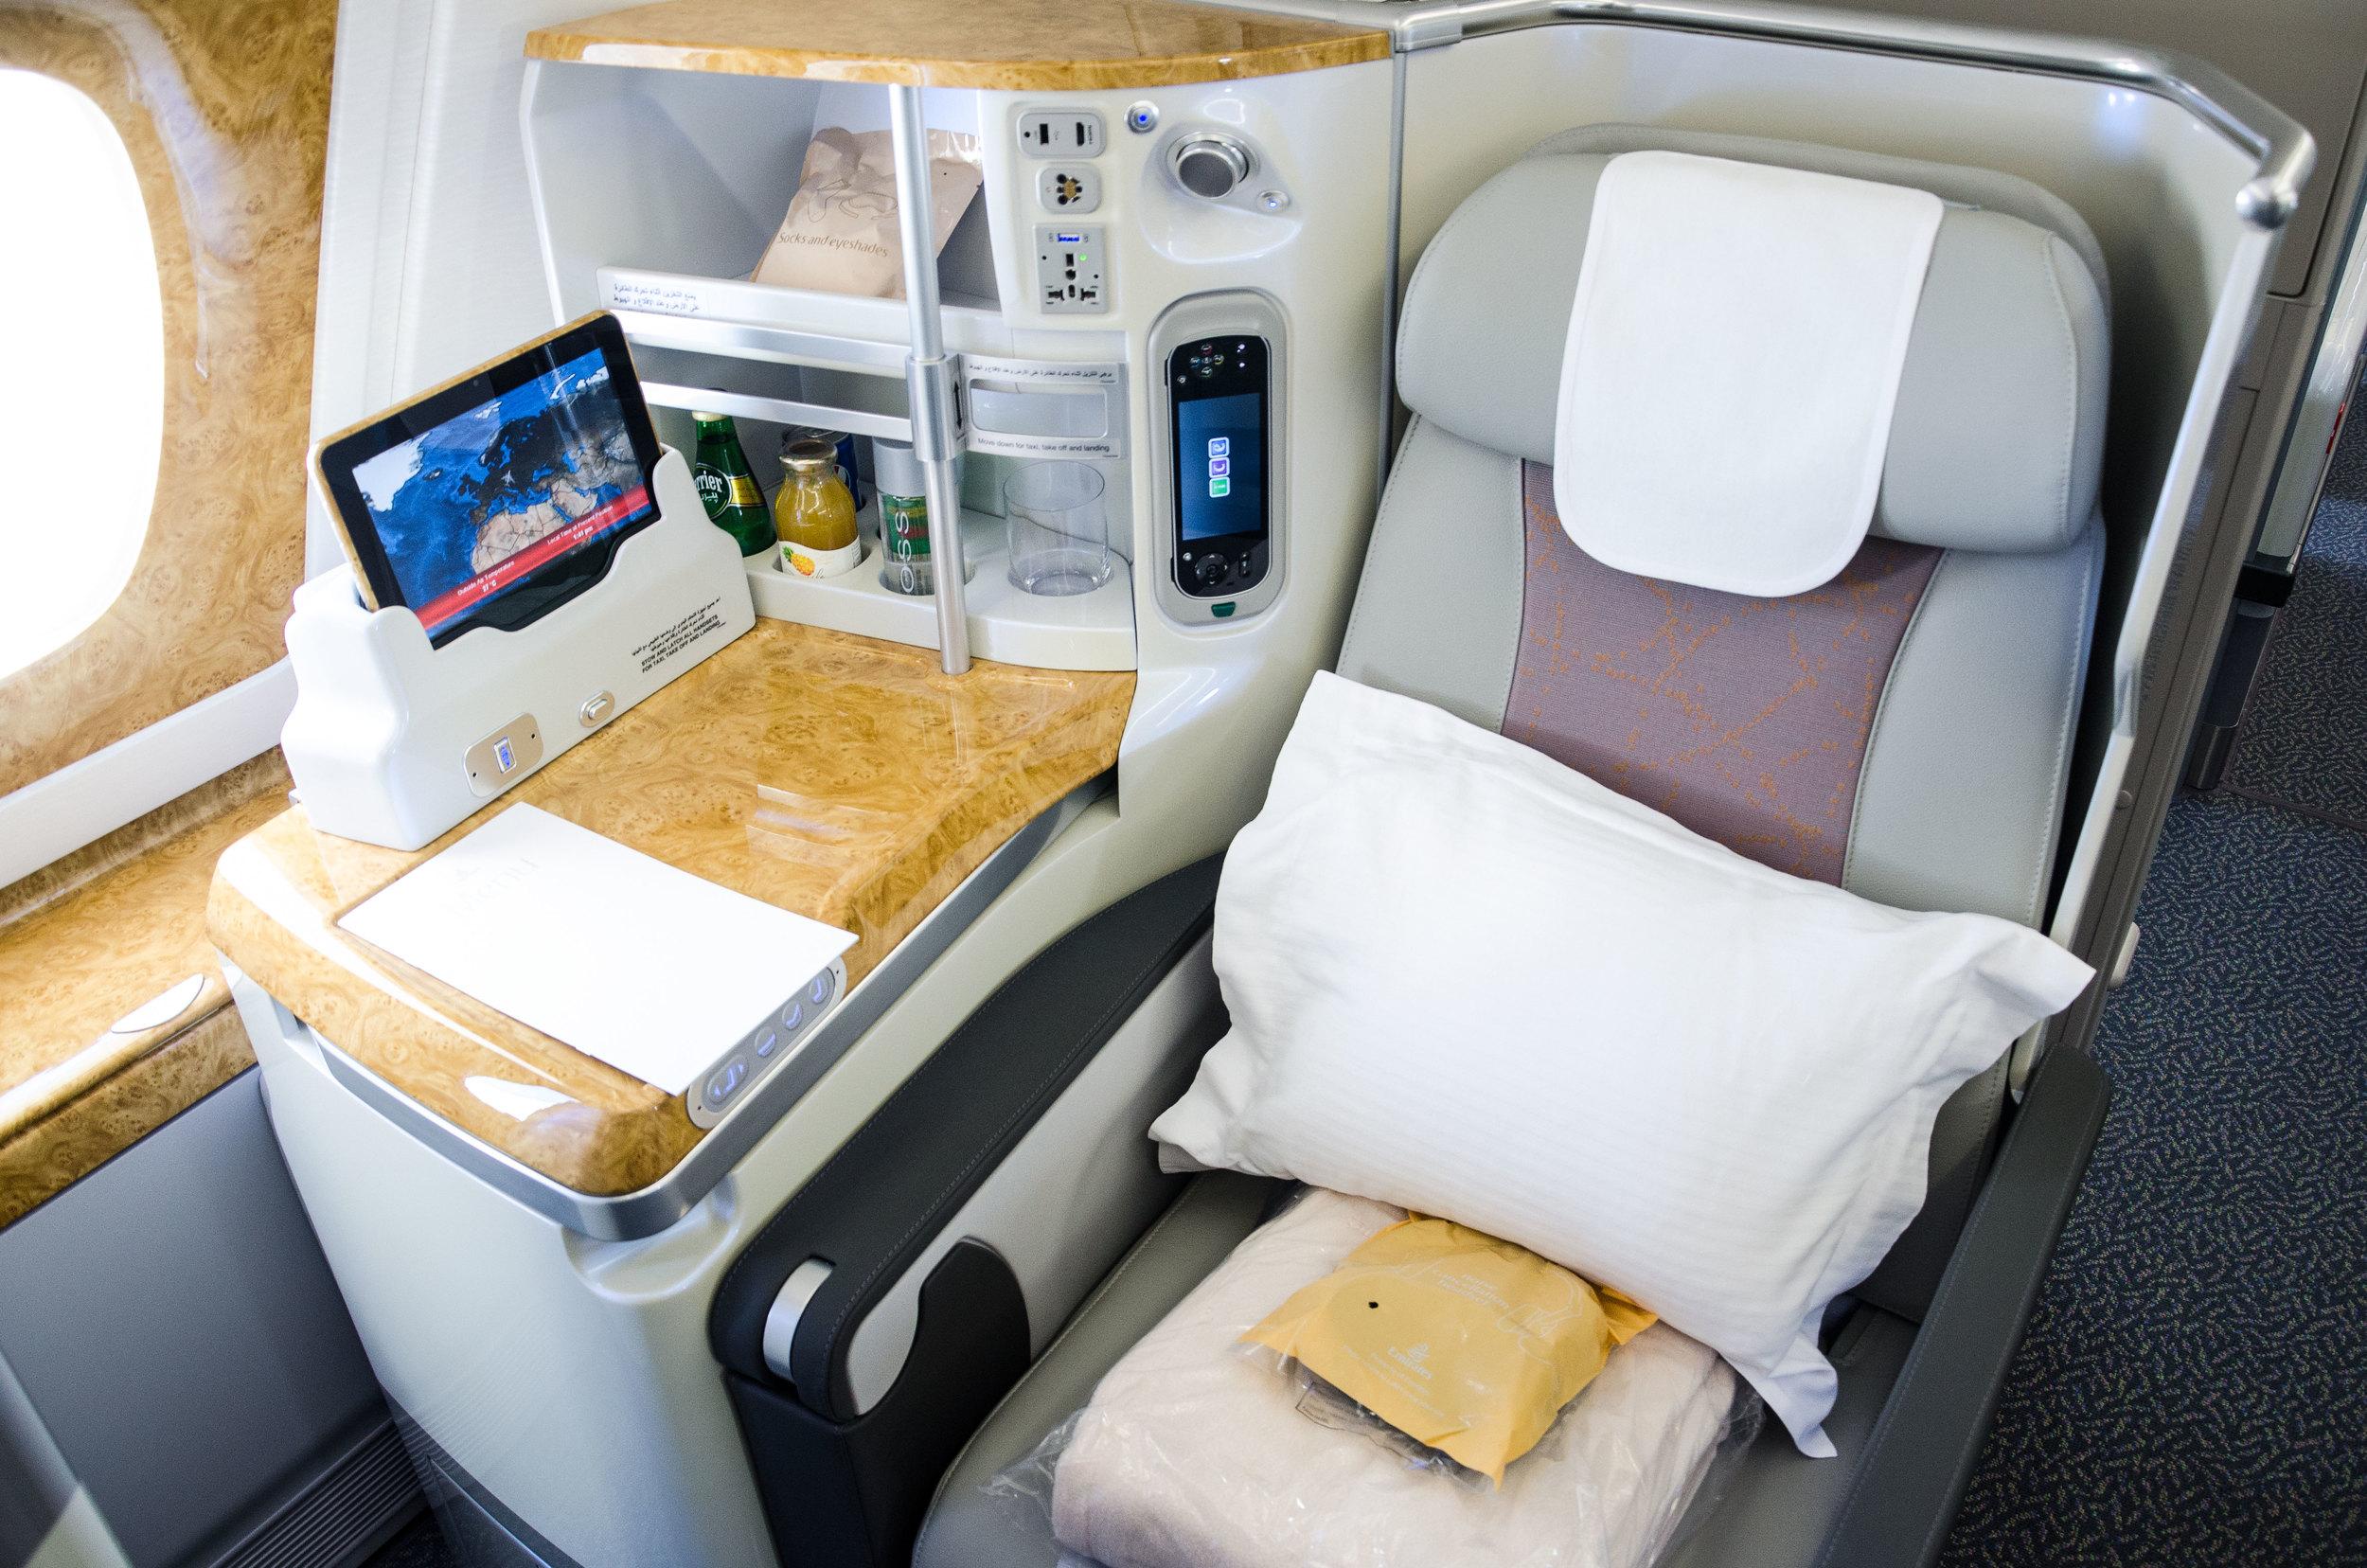 Emirates' Business Class Seat